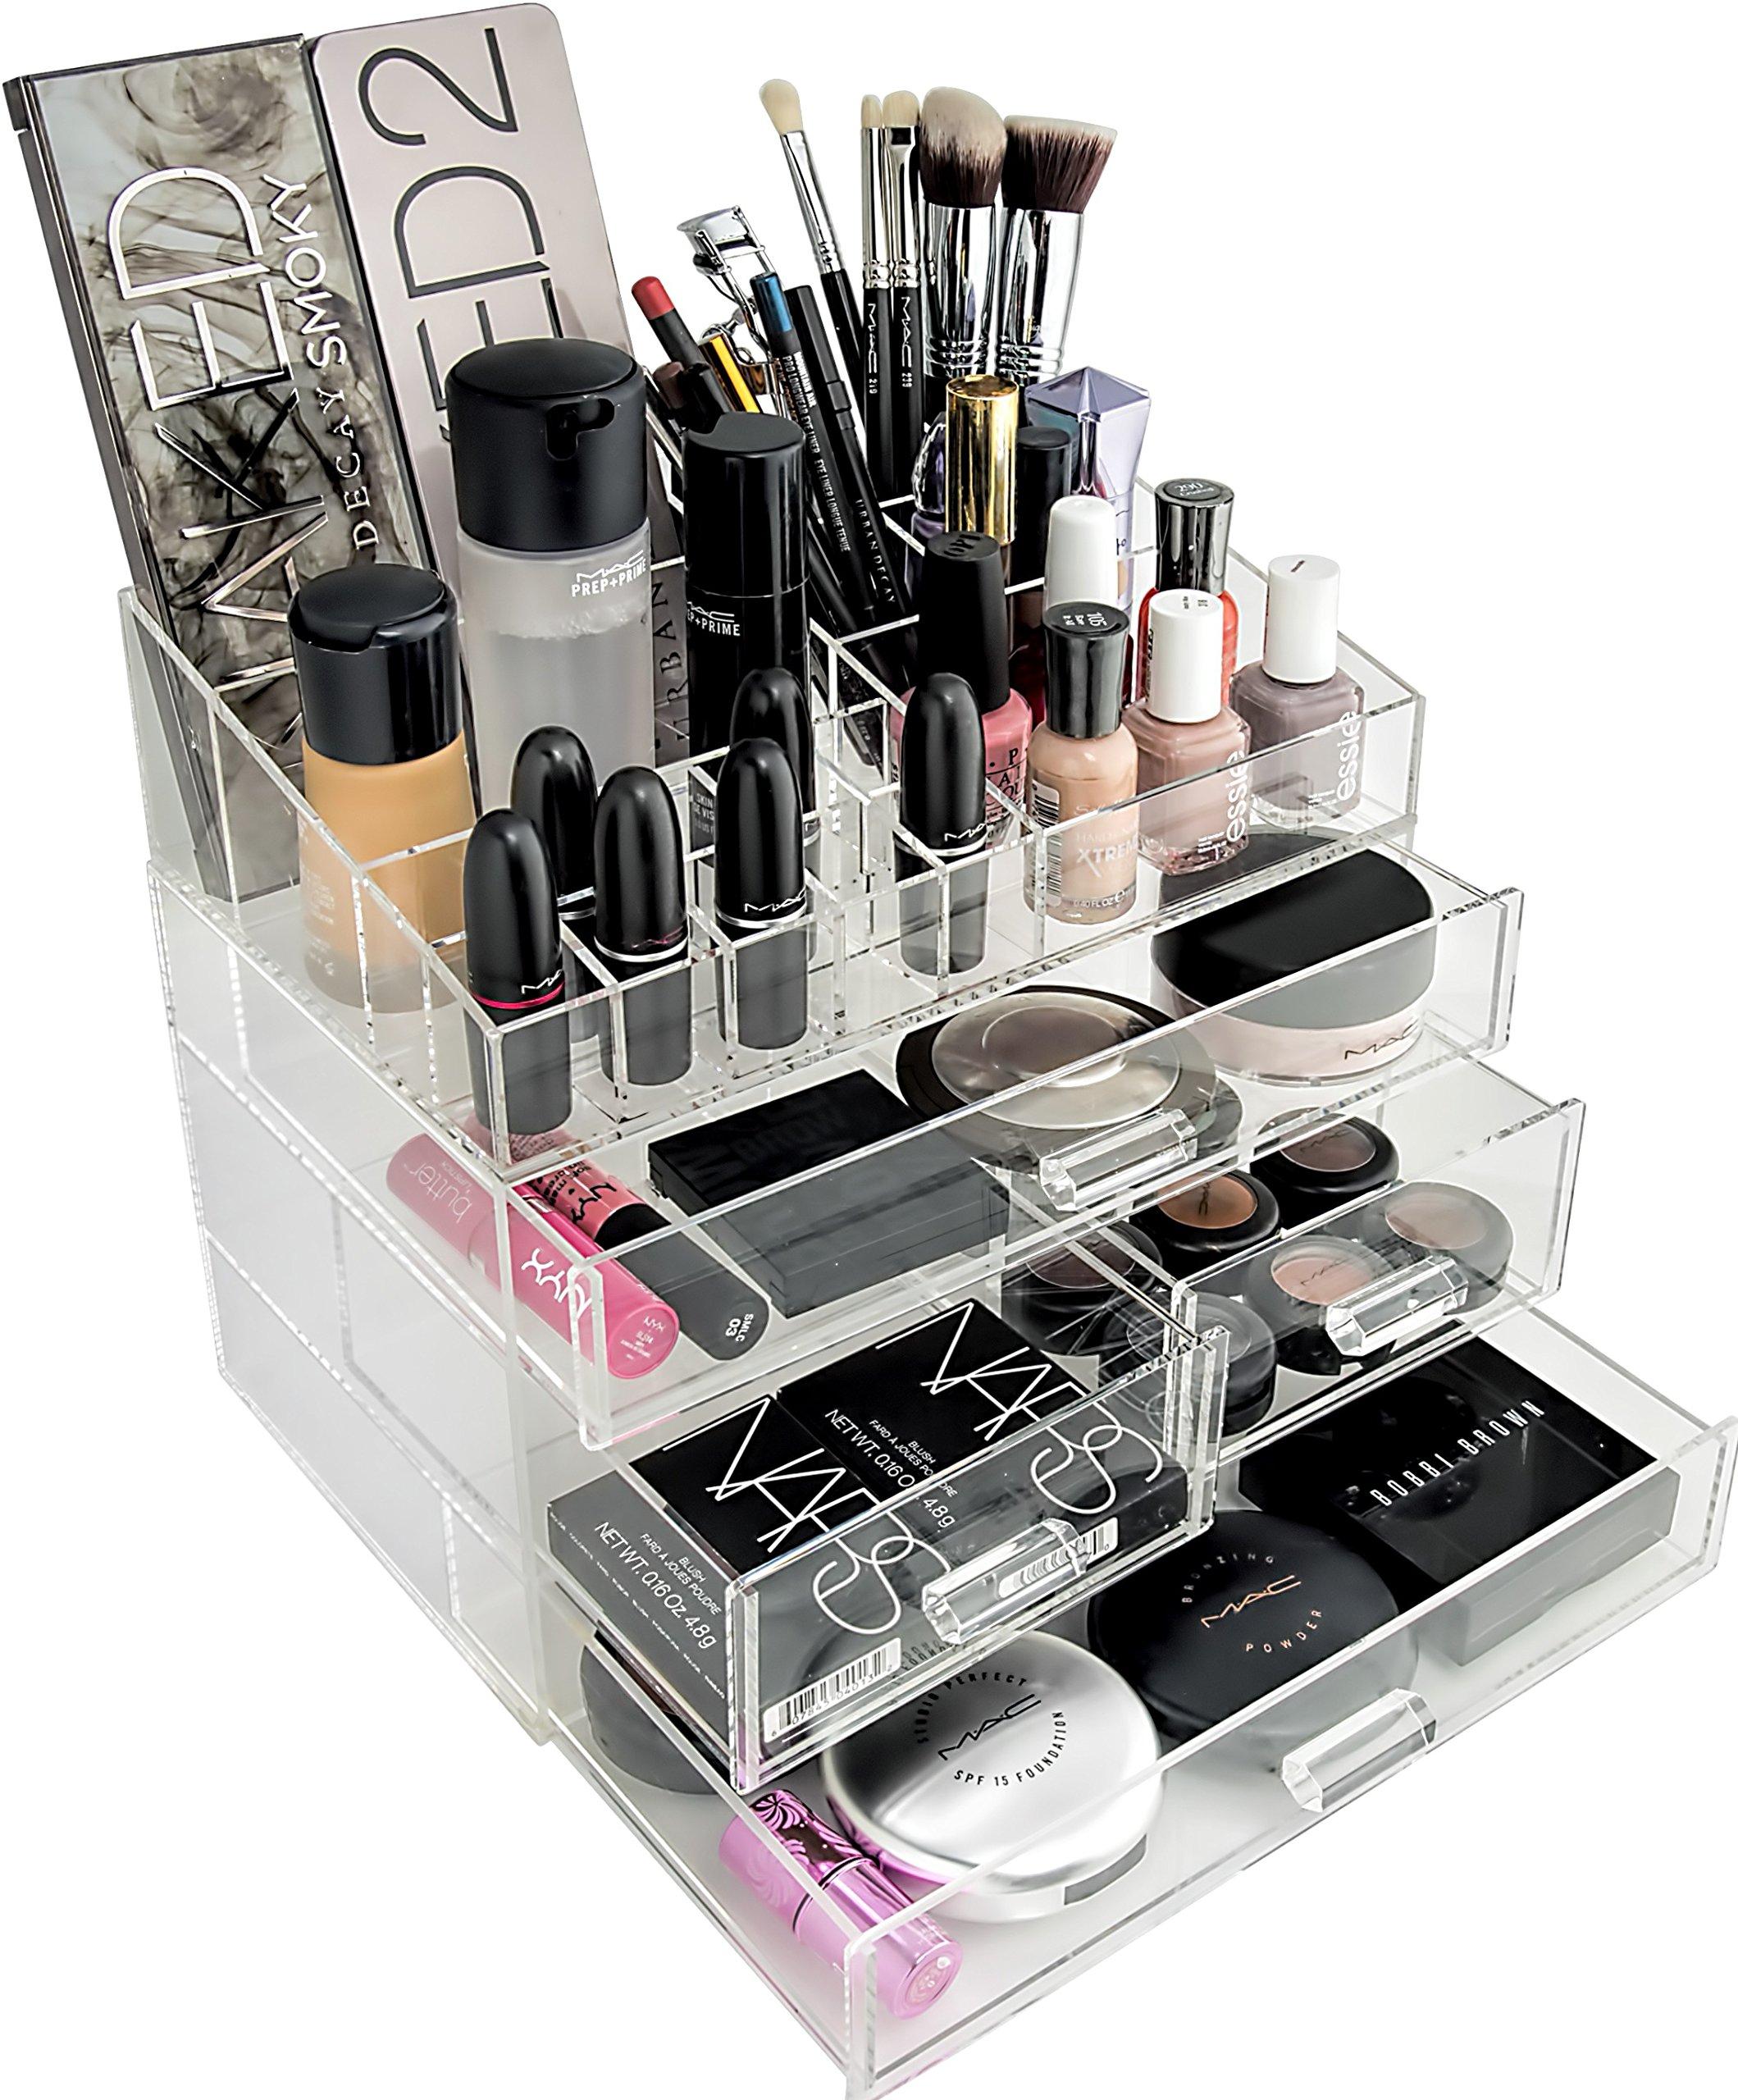 Organizta Acrylic Makeup & Cosmetic Organizer (Large)